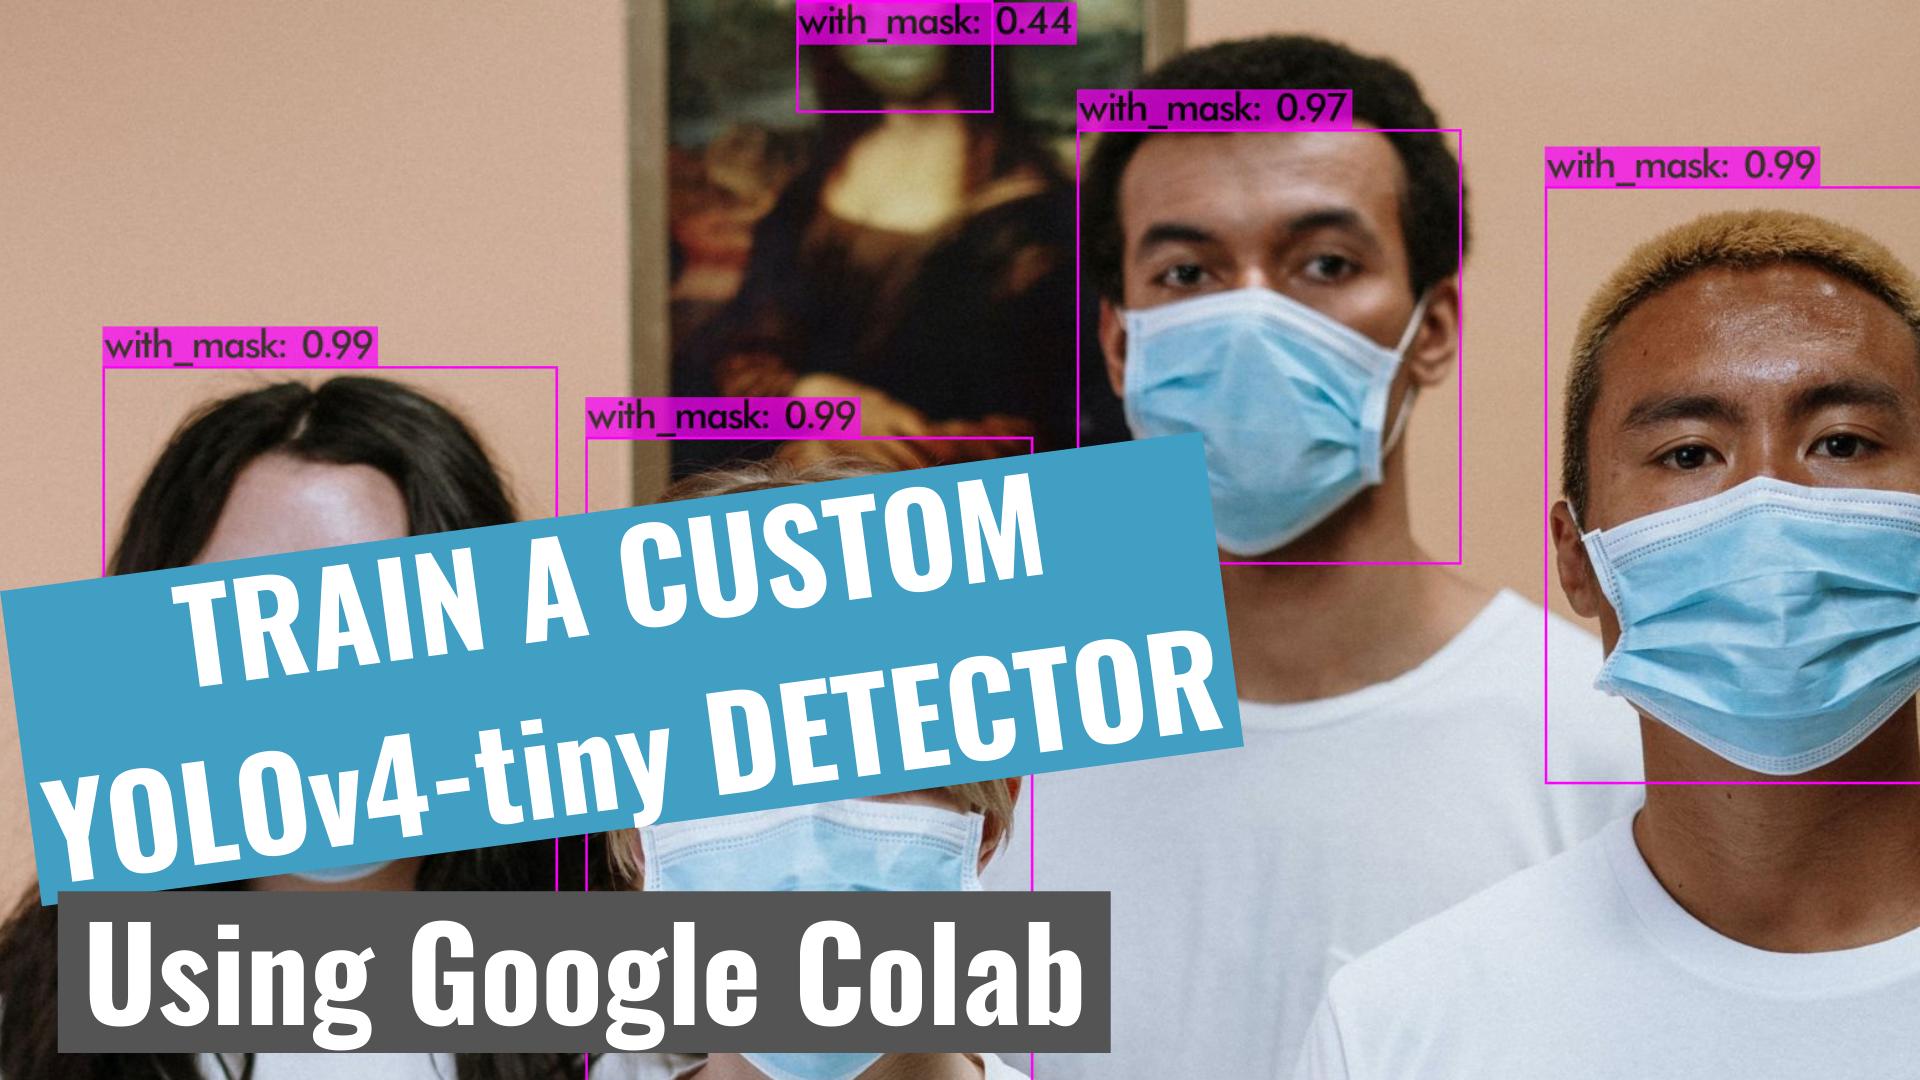 Train a custom YOLOv4-tiny detector using Google Colab